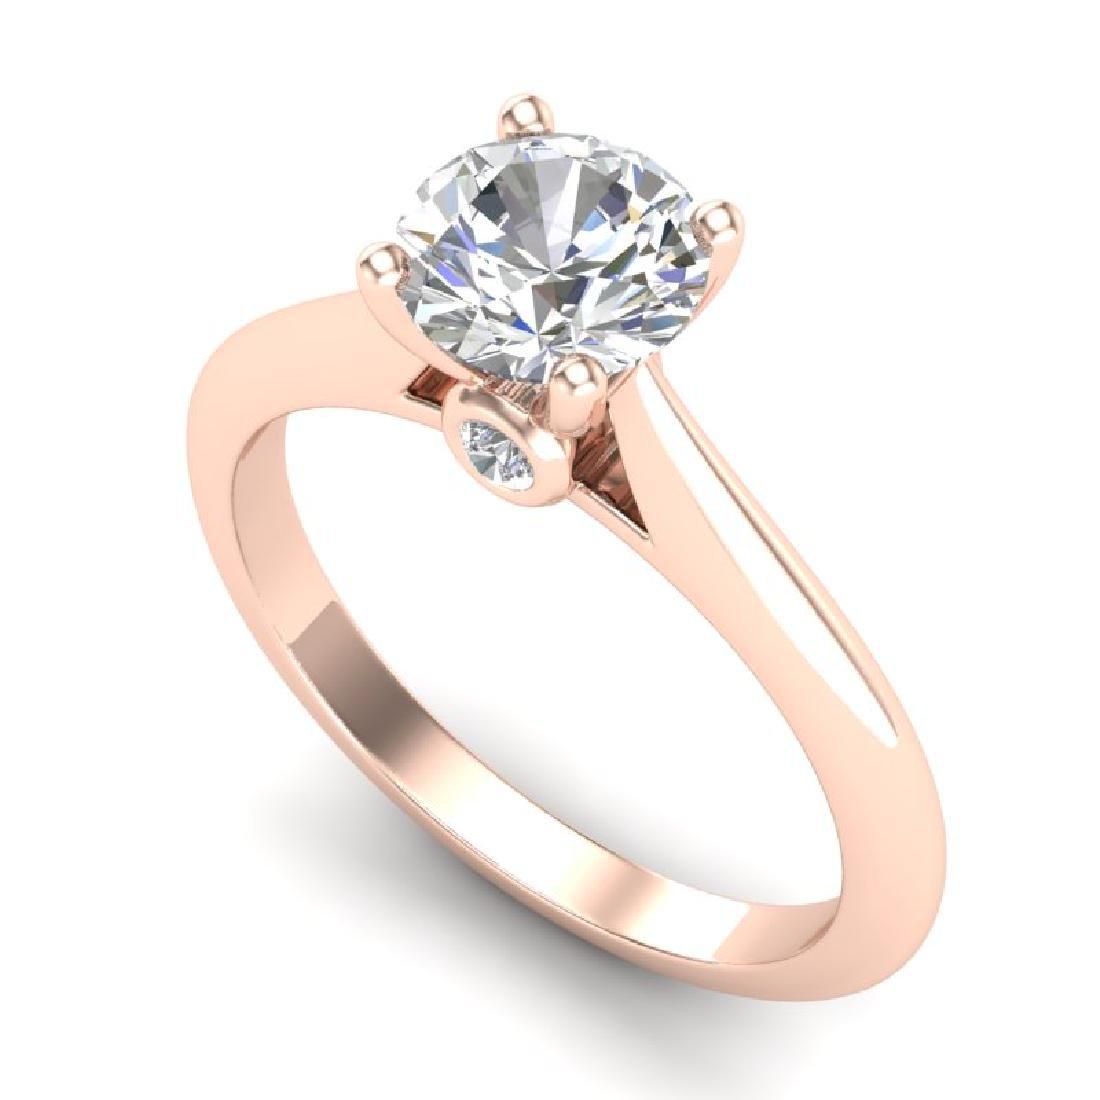 1.08 CTW VS/SI Diamond Solitaire Art Deco Ring 18K Rose